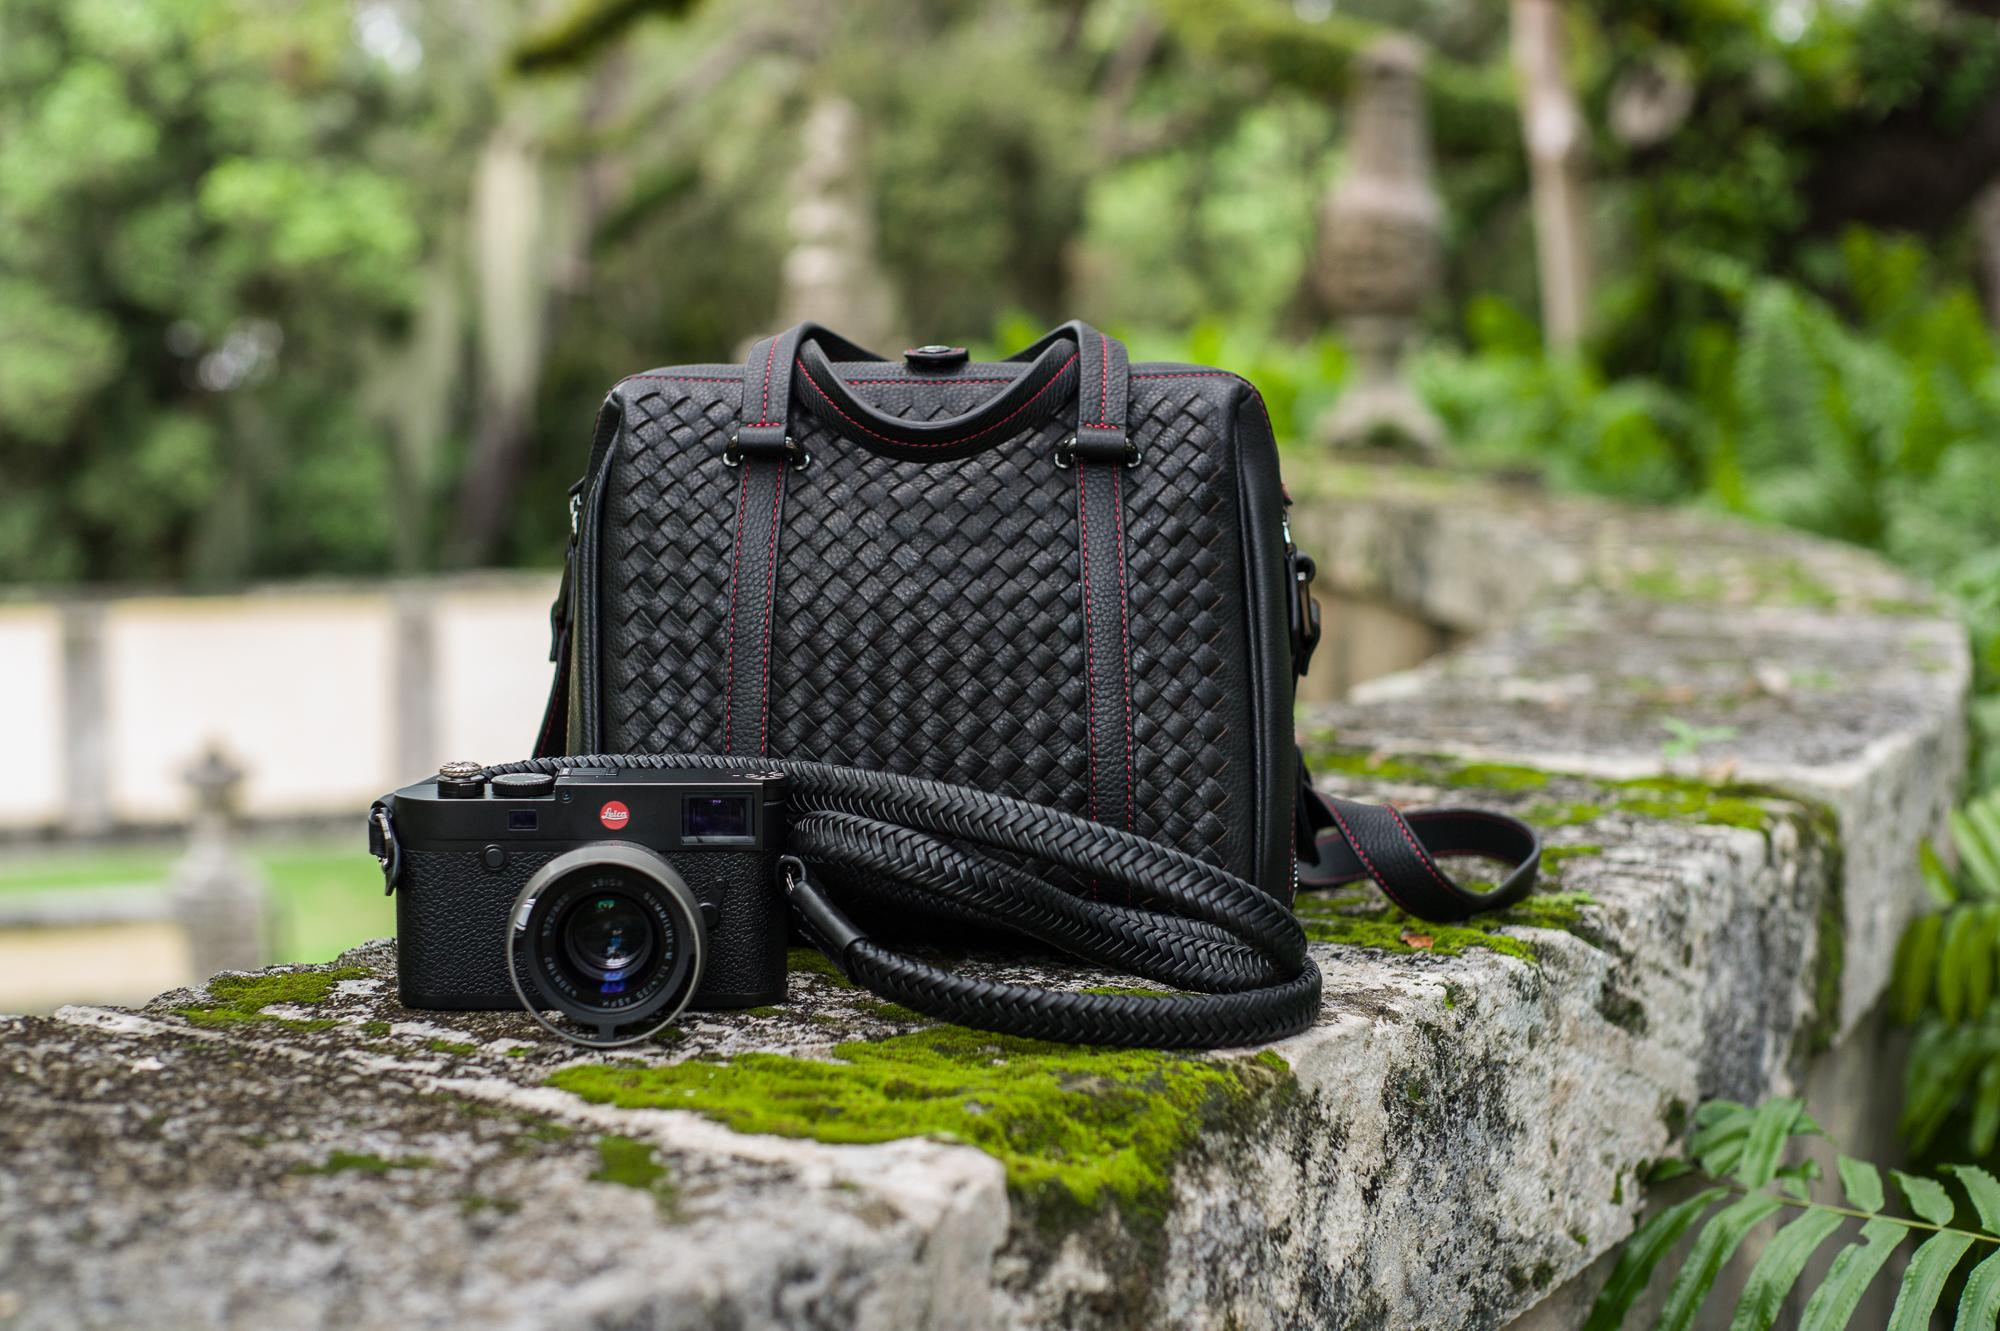 Vi Vante calibre bag Matador Noir braided leather 4 camera strap leica m10 summilux.jpg